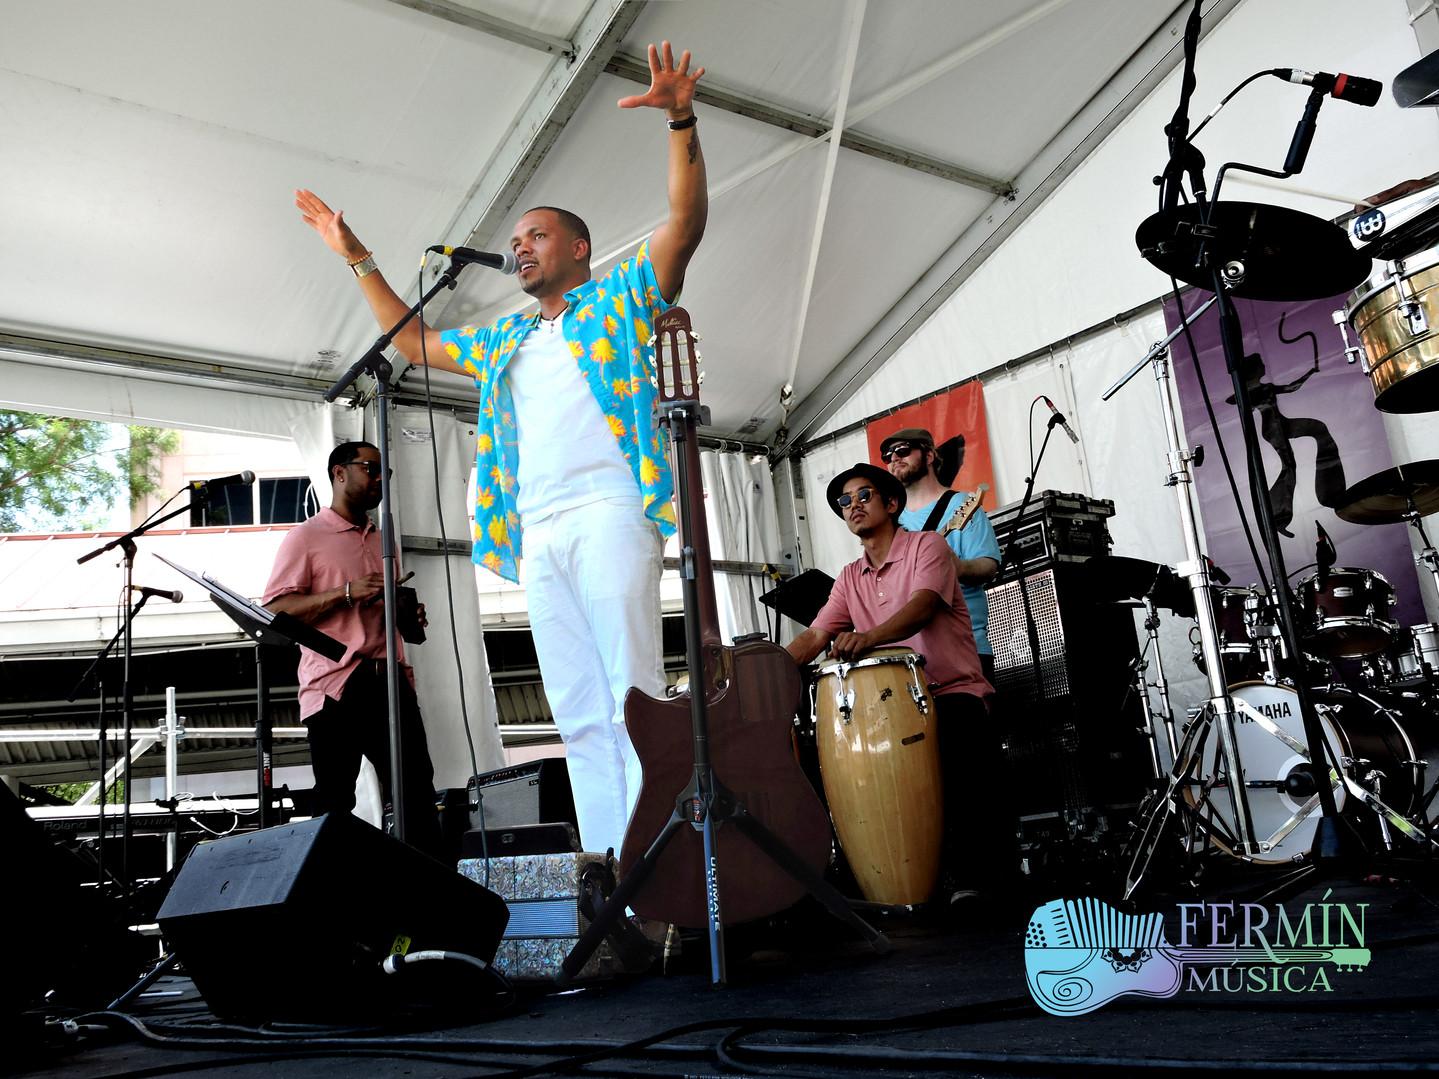 New Orleans 2018 Jazz & Heritage Festival (Jazz Fest 2018)